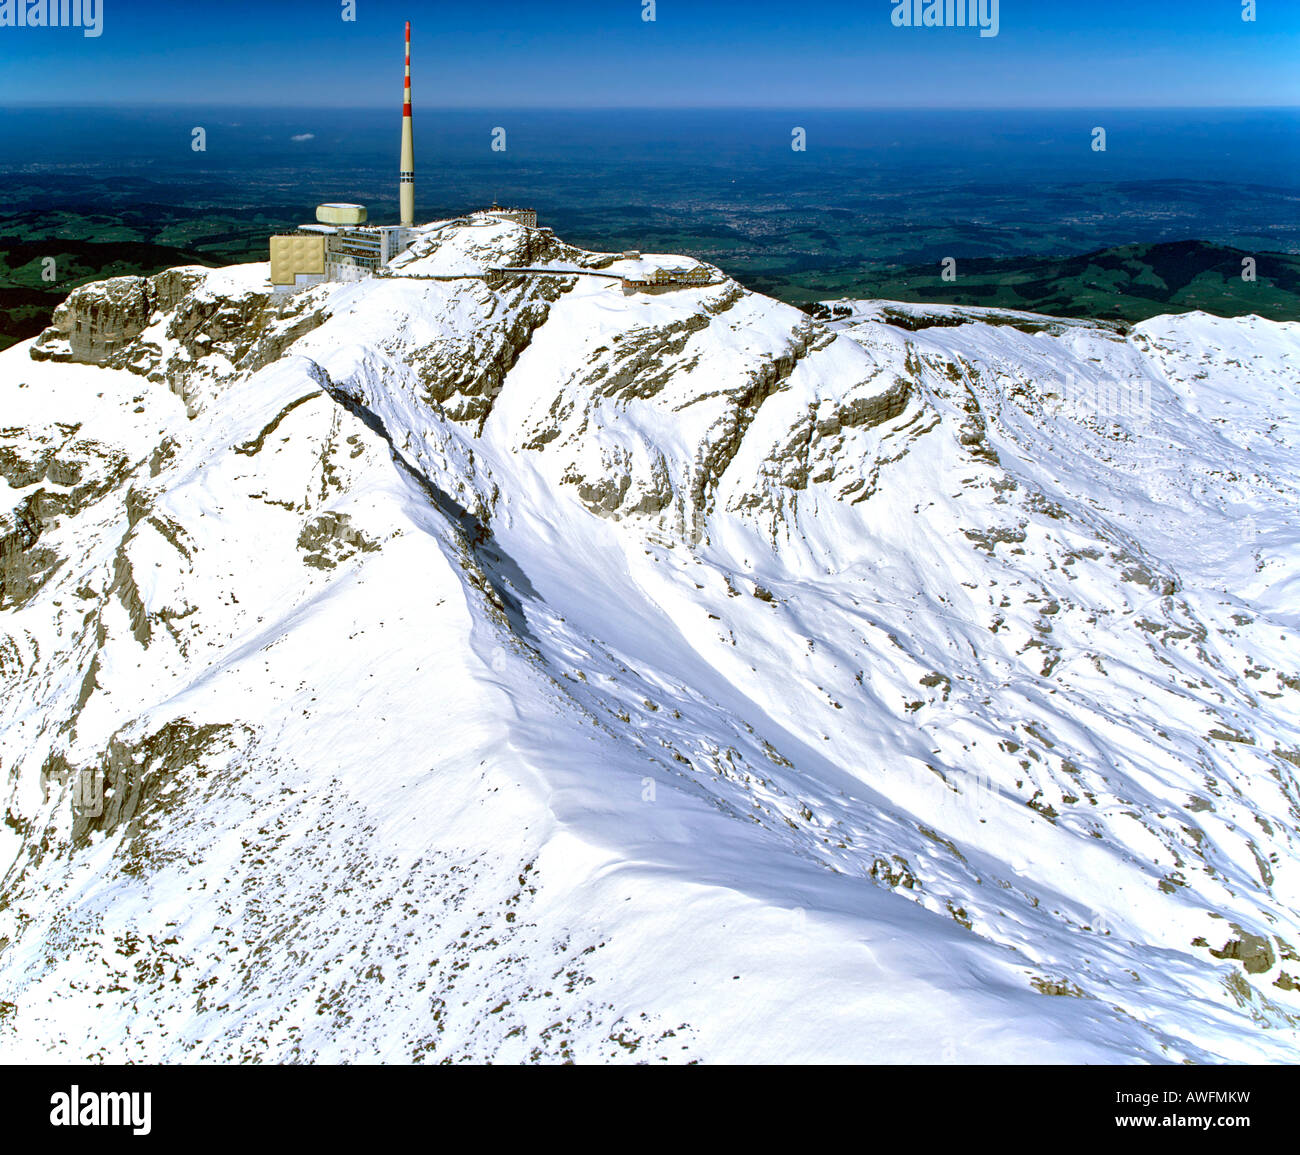 Aerial shot, Saentis, radio tower, Appenzeller Alps, Appenzell, Switzerland, Europe - Stock Image